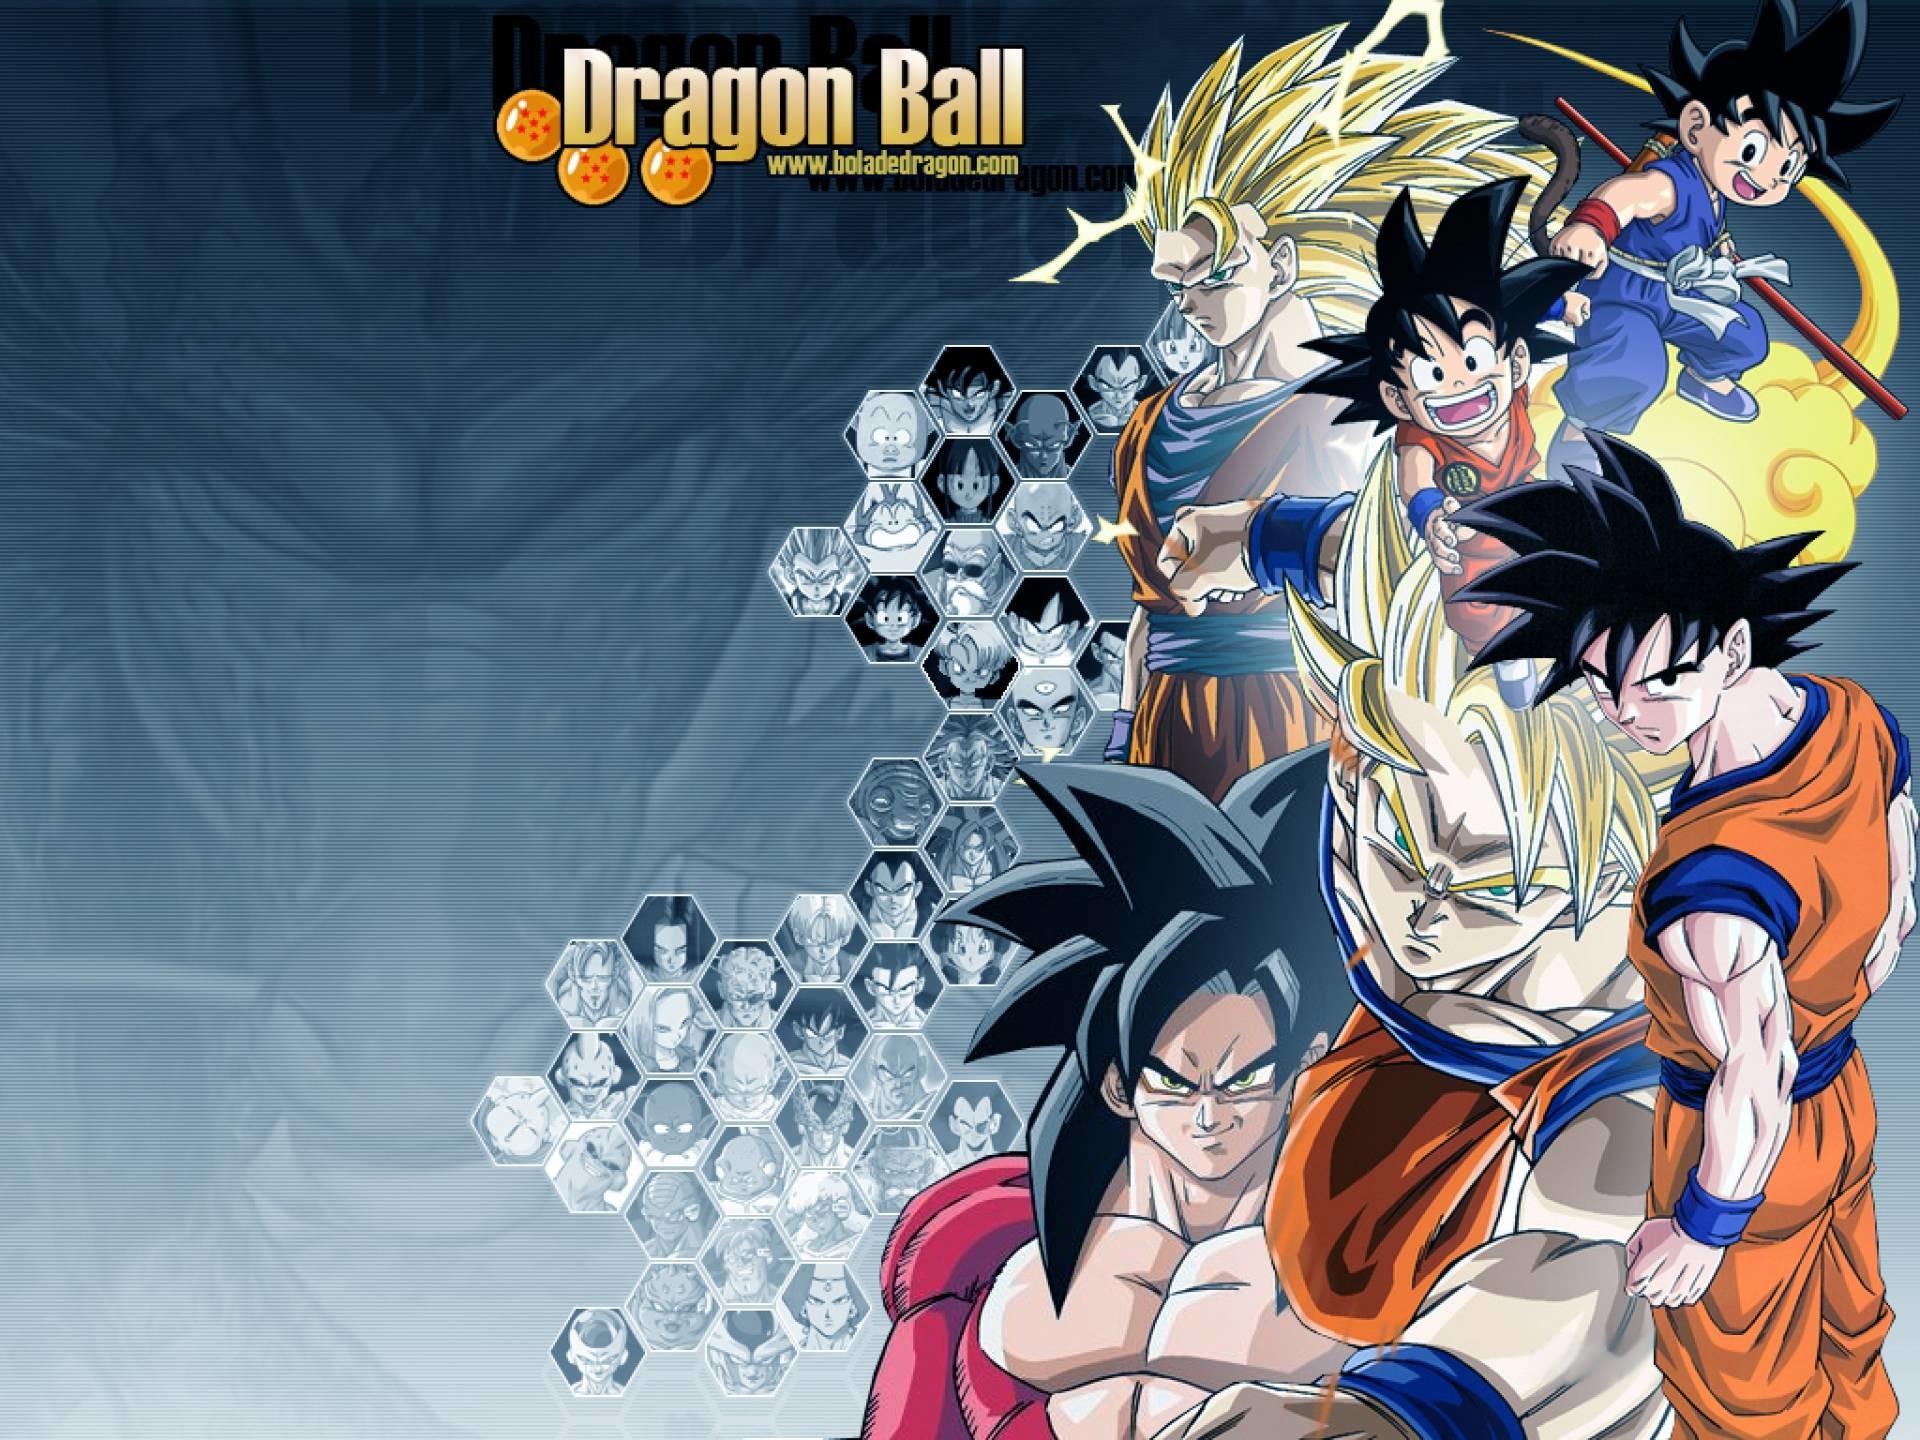 Dragon Ball Z 1080p Wallpaper 64 Images